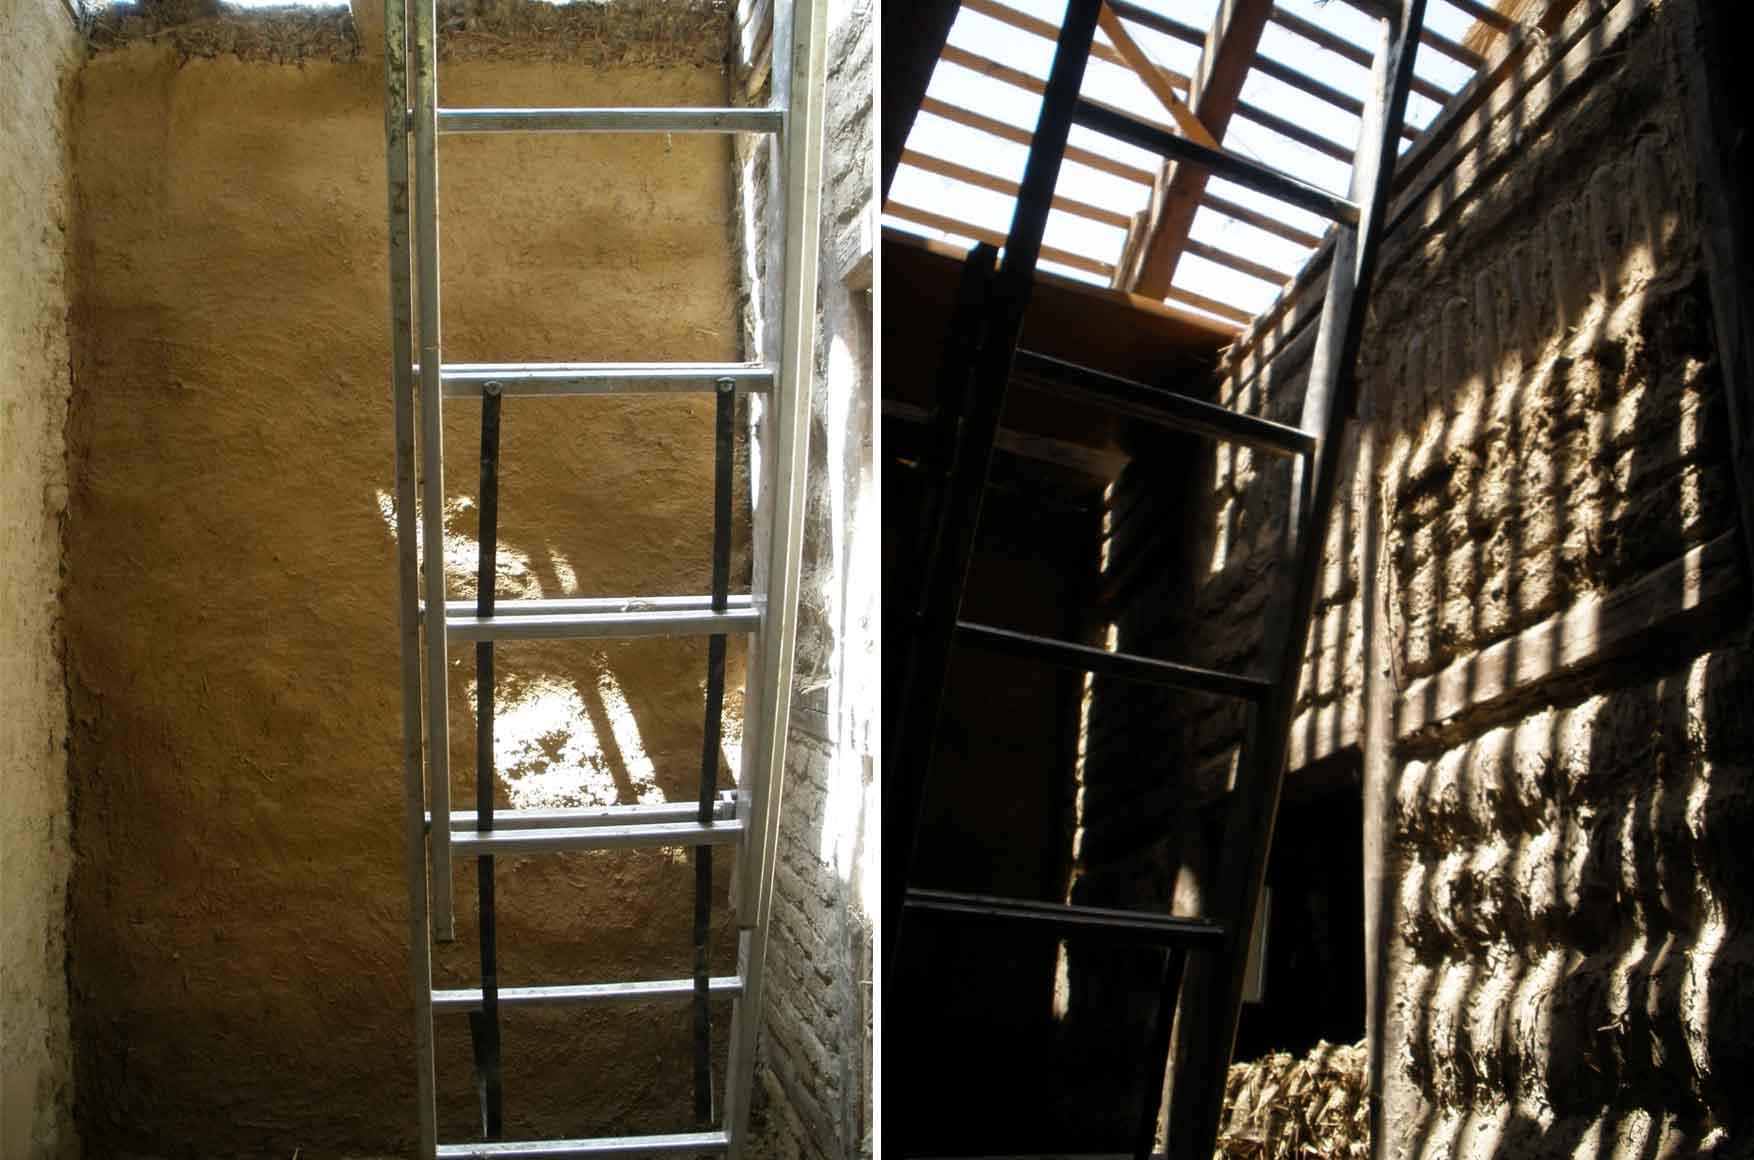 11 jun trska radionica zemljani radovi blatni malteri